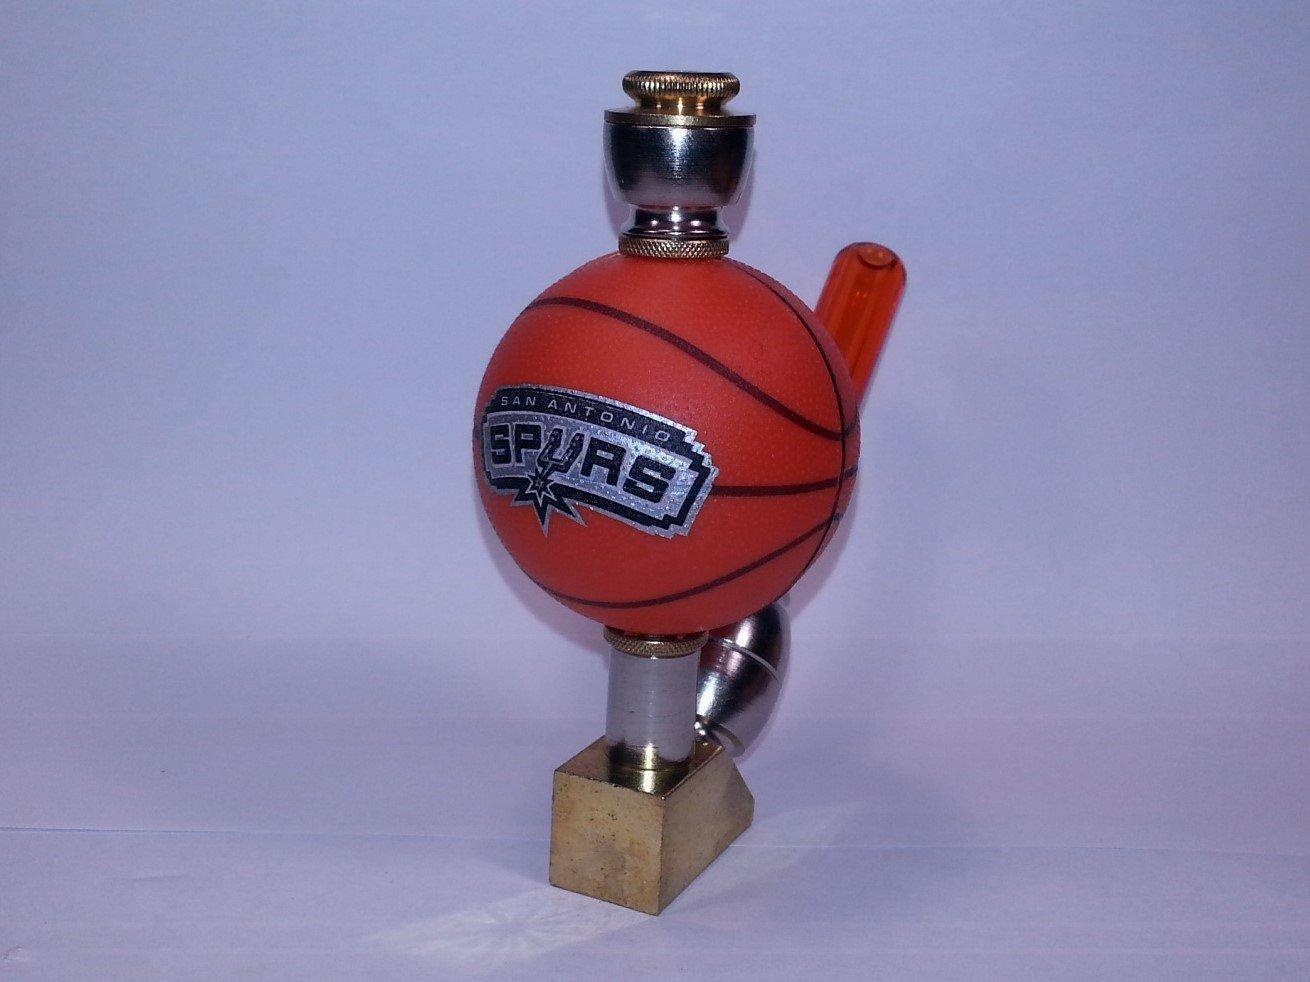 San Antonio Spurs NBA Basketball Pipe Wedge Design Nickel/Brass Finish